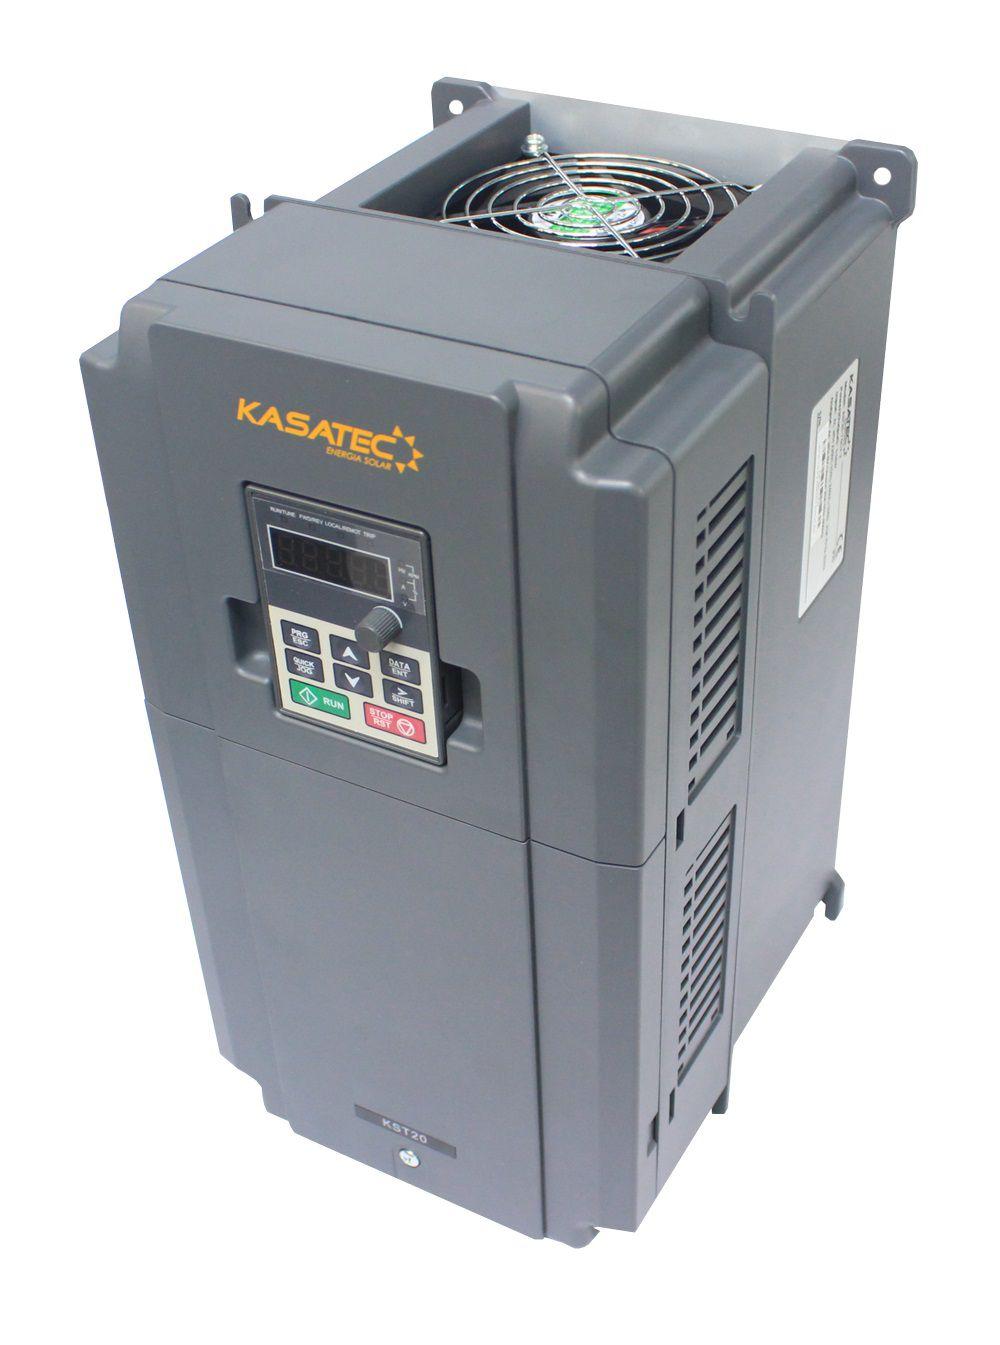 Inversor frequencia KST20 - 5cv/7,5cv  - Kasatec Energia Solar